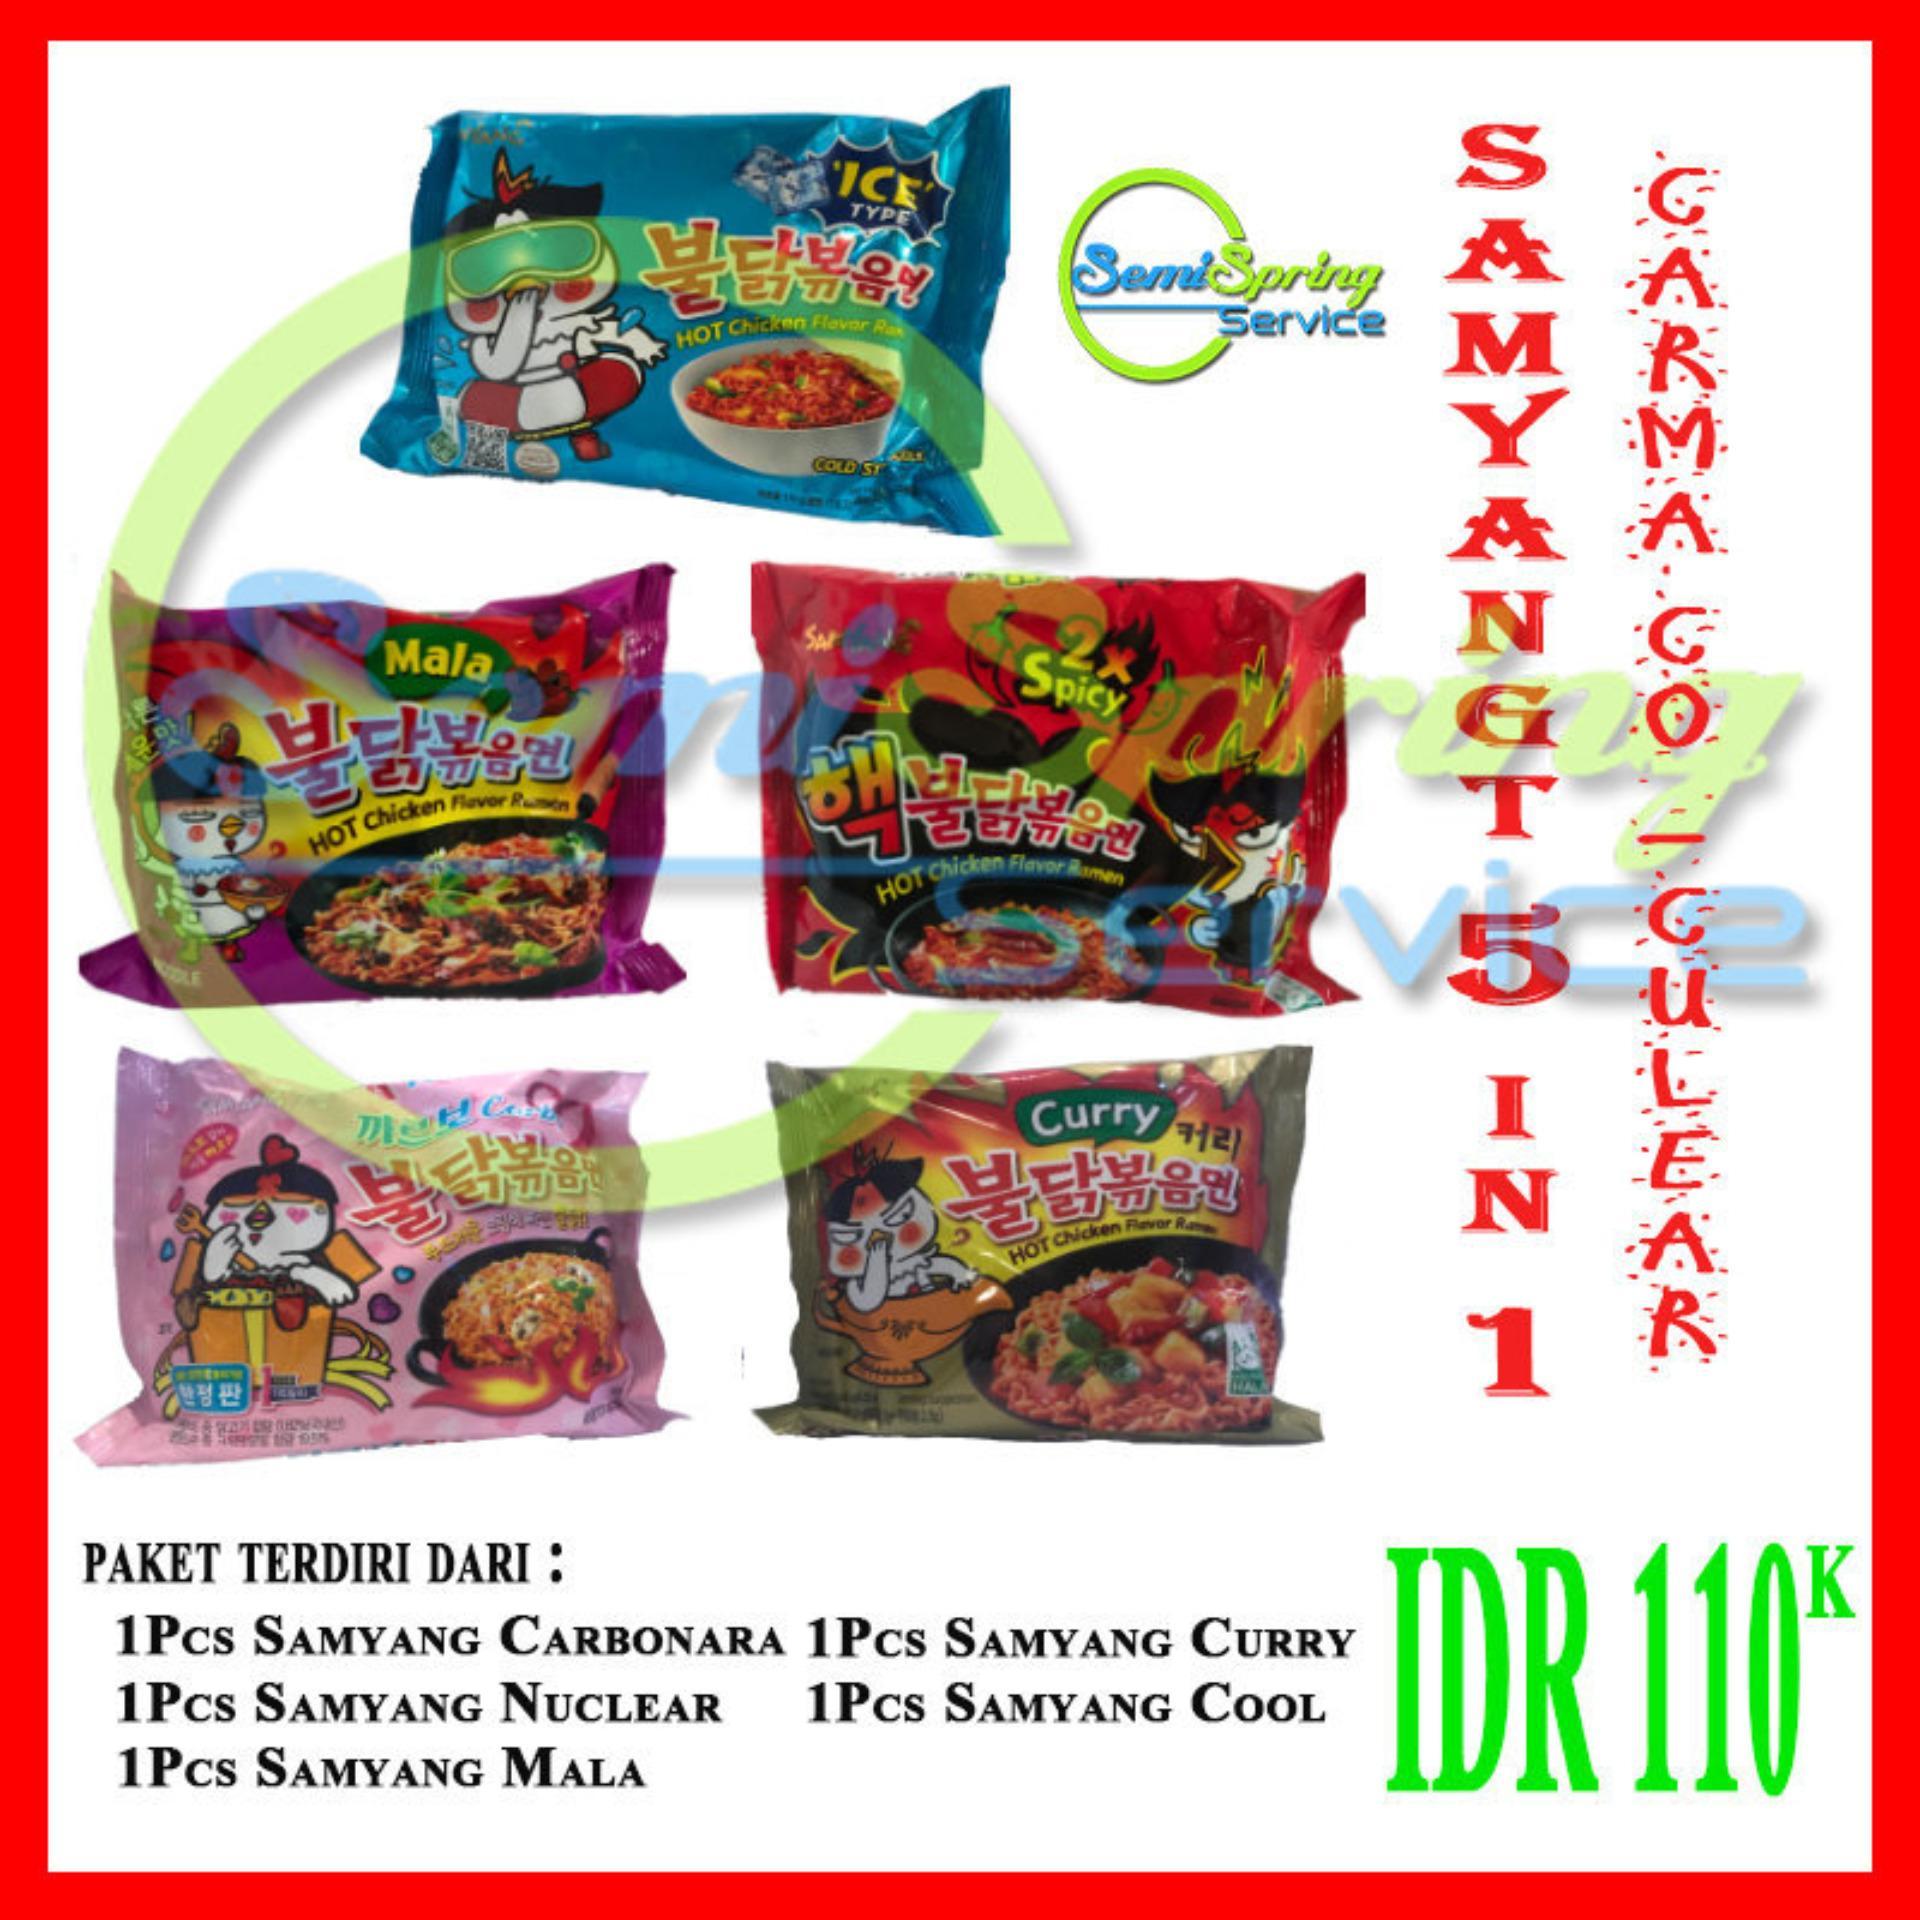 Jual Produk Mie Samyang Terbaru Hot Spicy Chicken Isi 5 Pcs 5in1 Carma Co Curlear